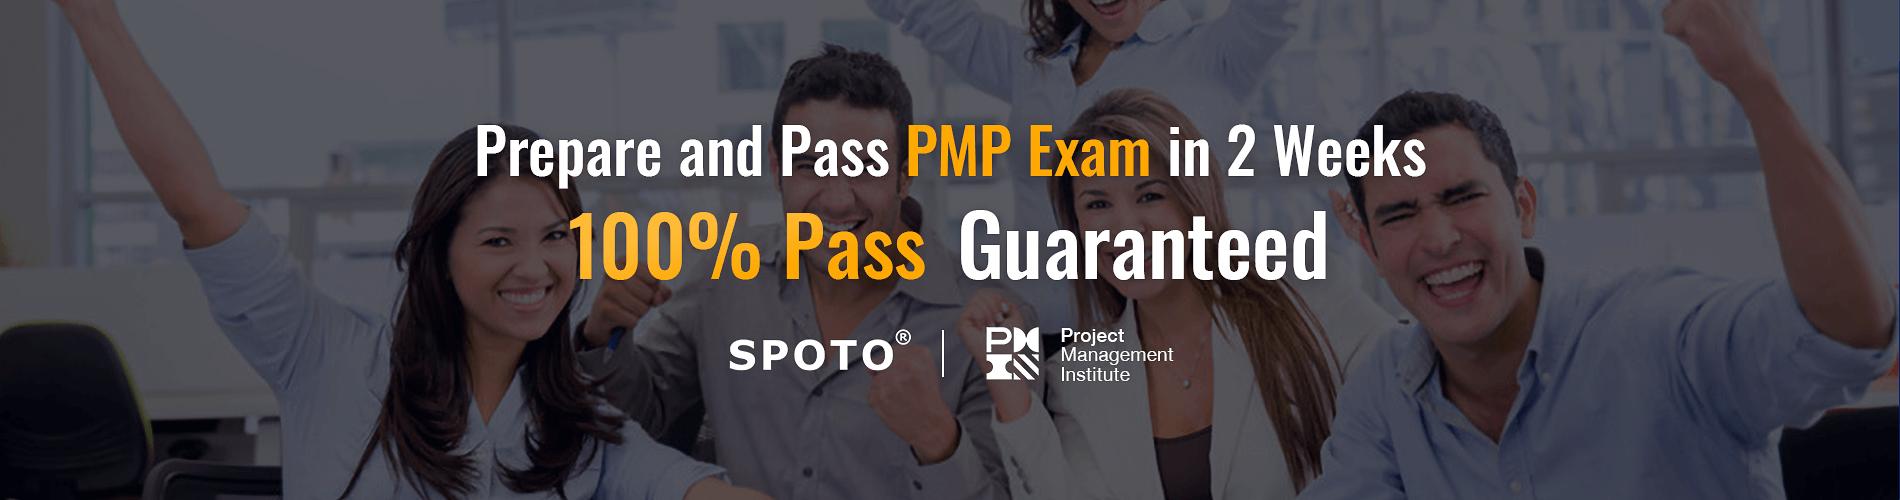 100% Pass PMP Exam